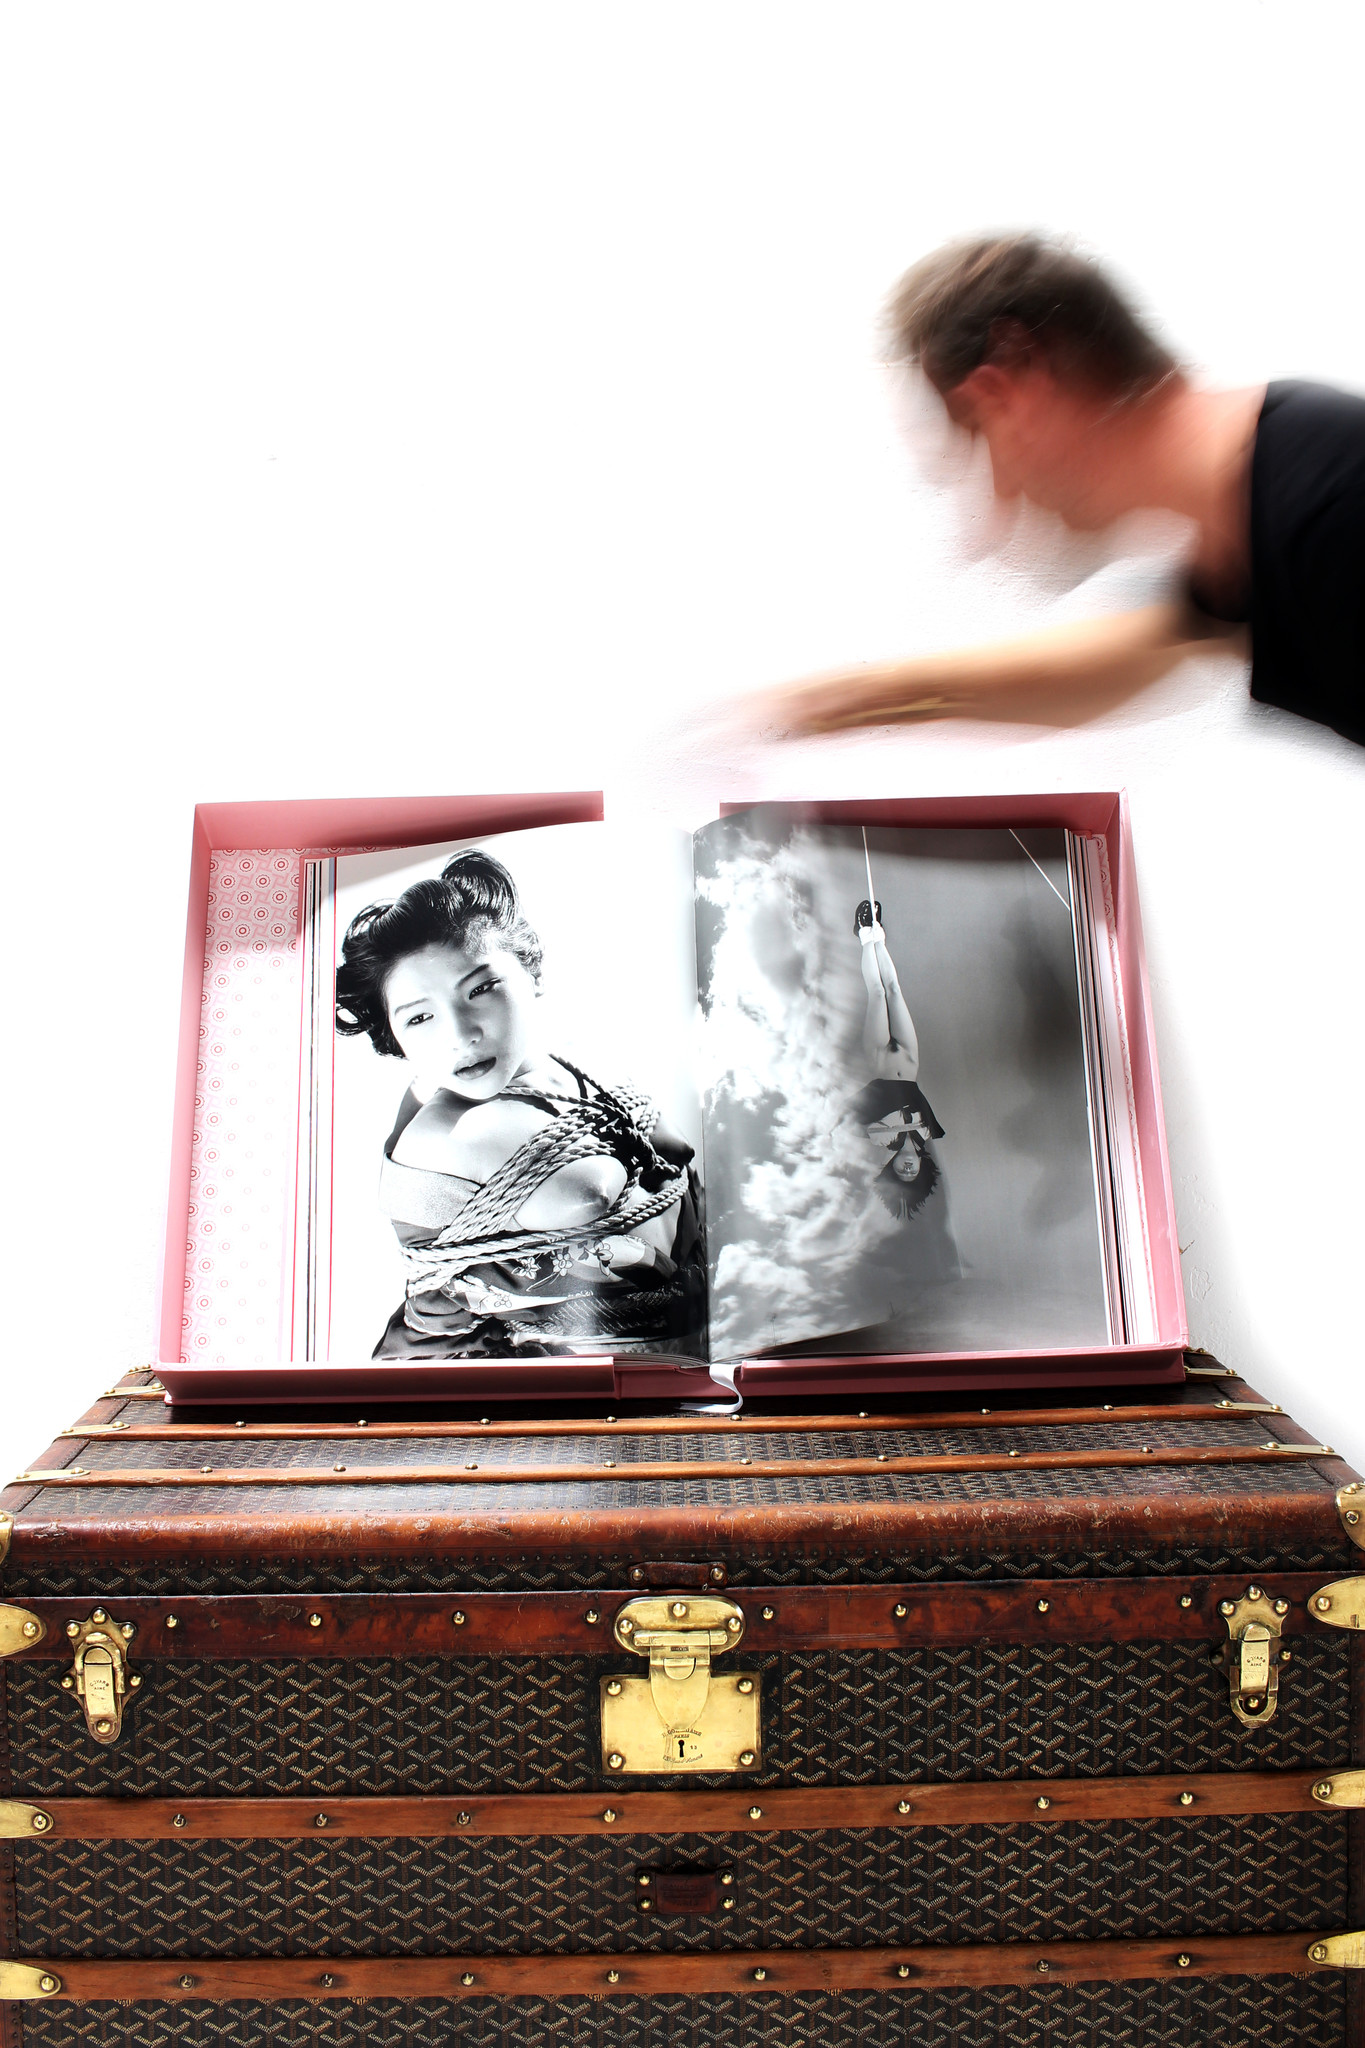 Araki XXL photo album, limited edition